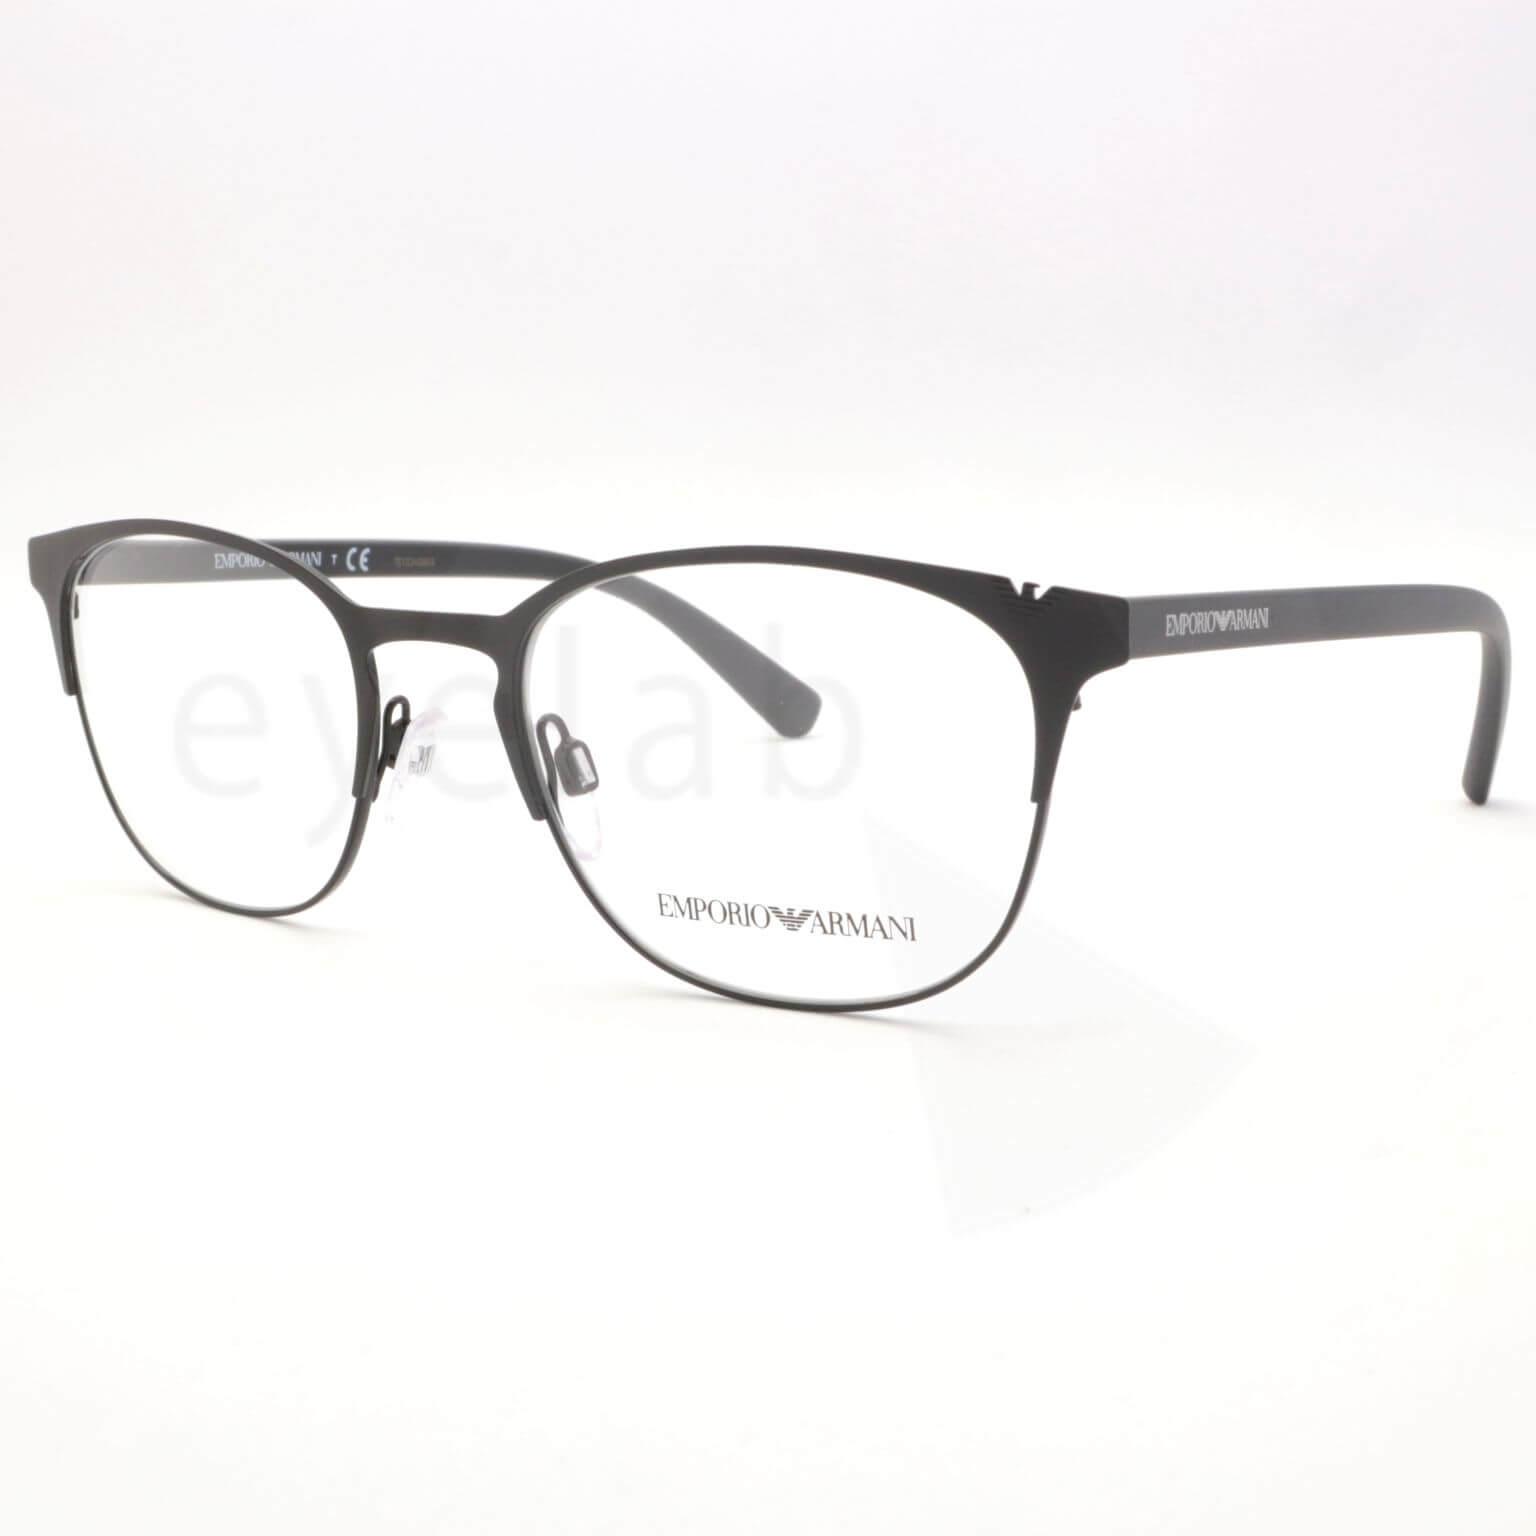 41e3631cb9 Emporio Armani 1059 3001 51 ~ Οπτικά Eyelab